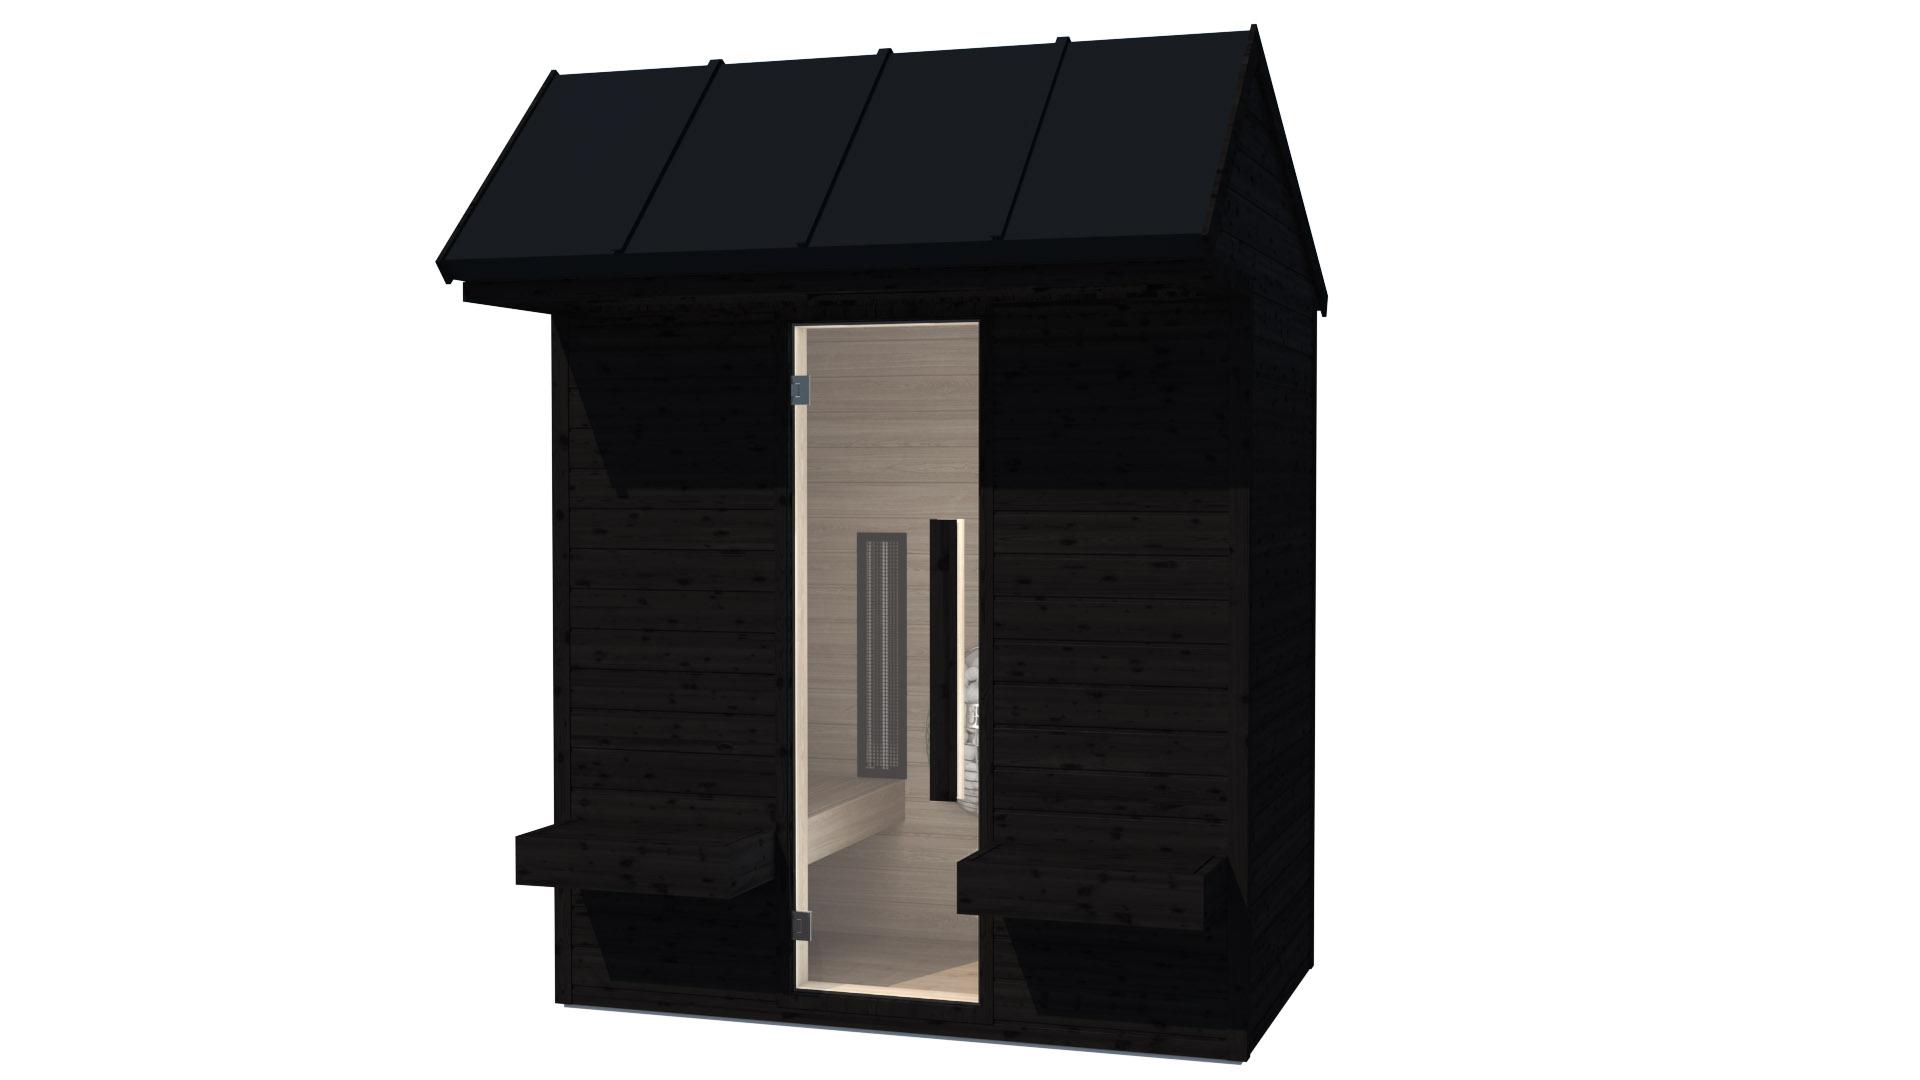 INUA Heimdall udendoers kombi sauna_infraroed